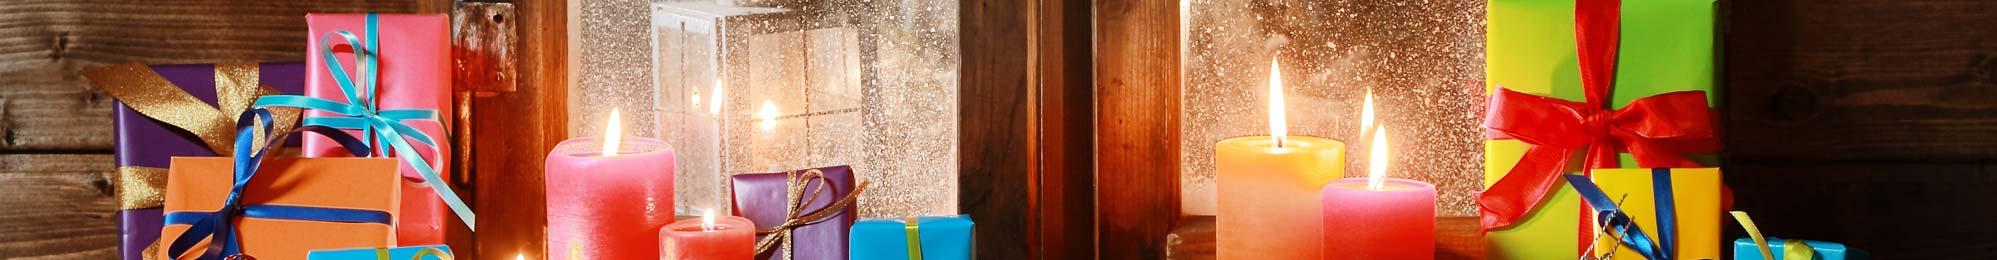 kerzenst nder julgris f r 4 kerzen wei st berkiste. Black Bedroom Furniture Sets. Home Design Ideas